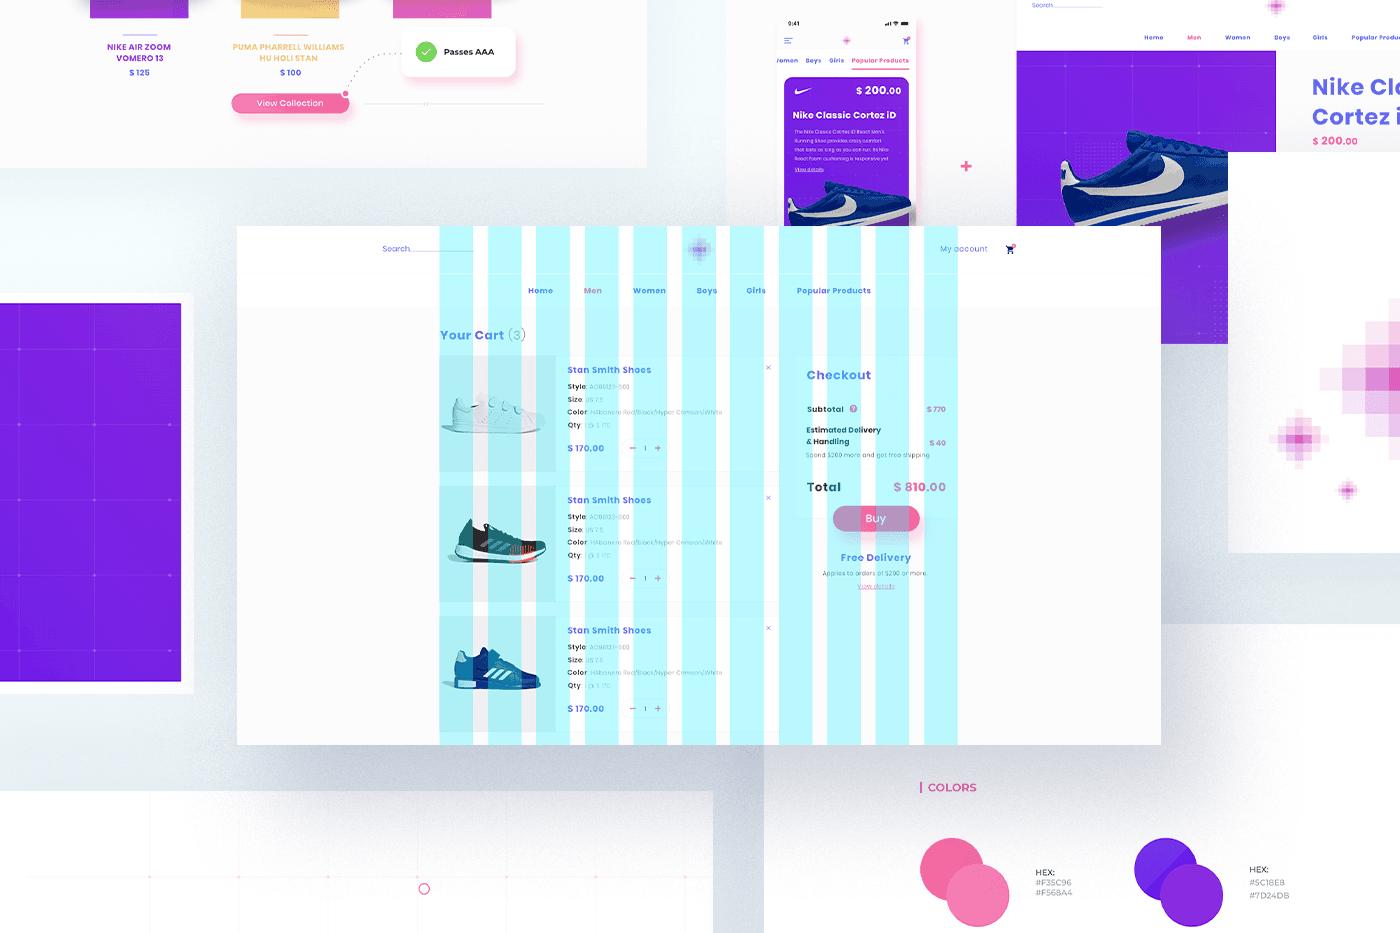 web design standards 2020 for colors